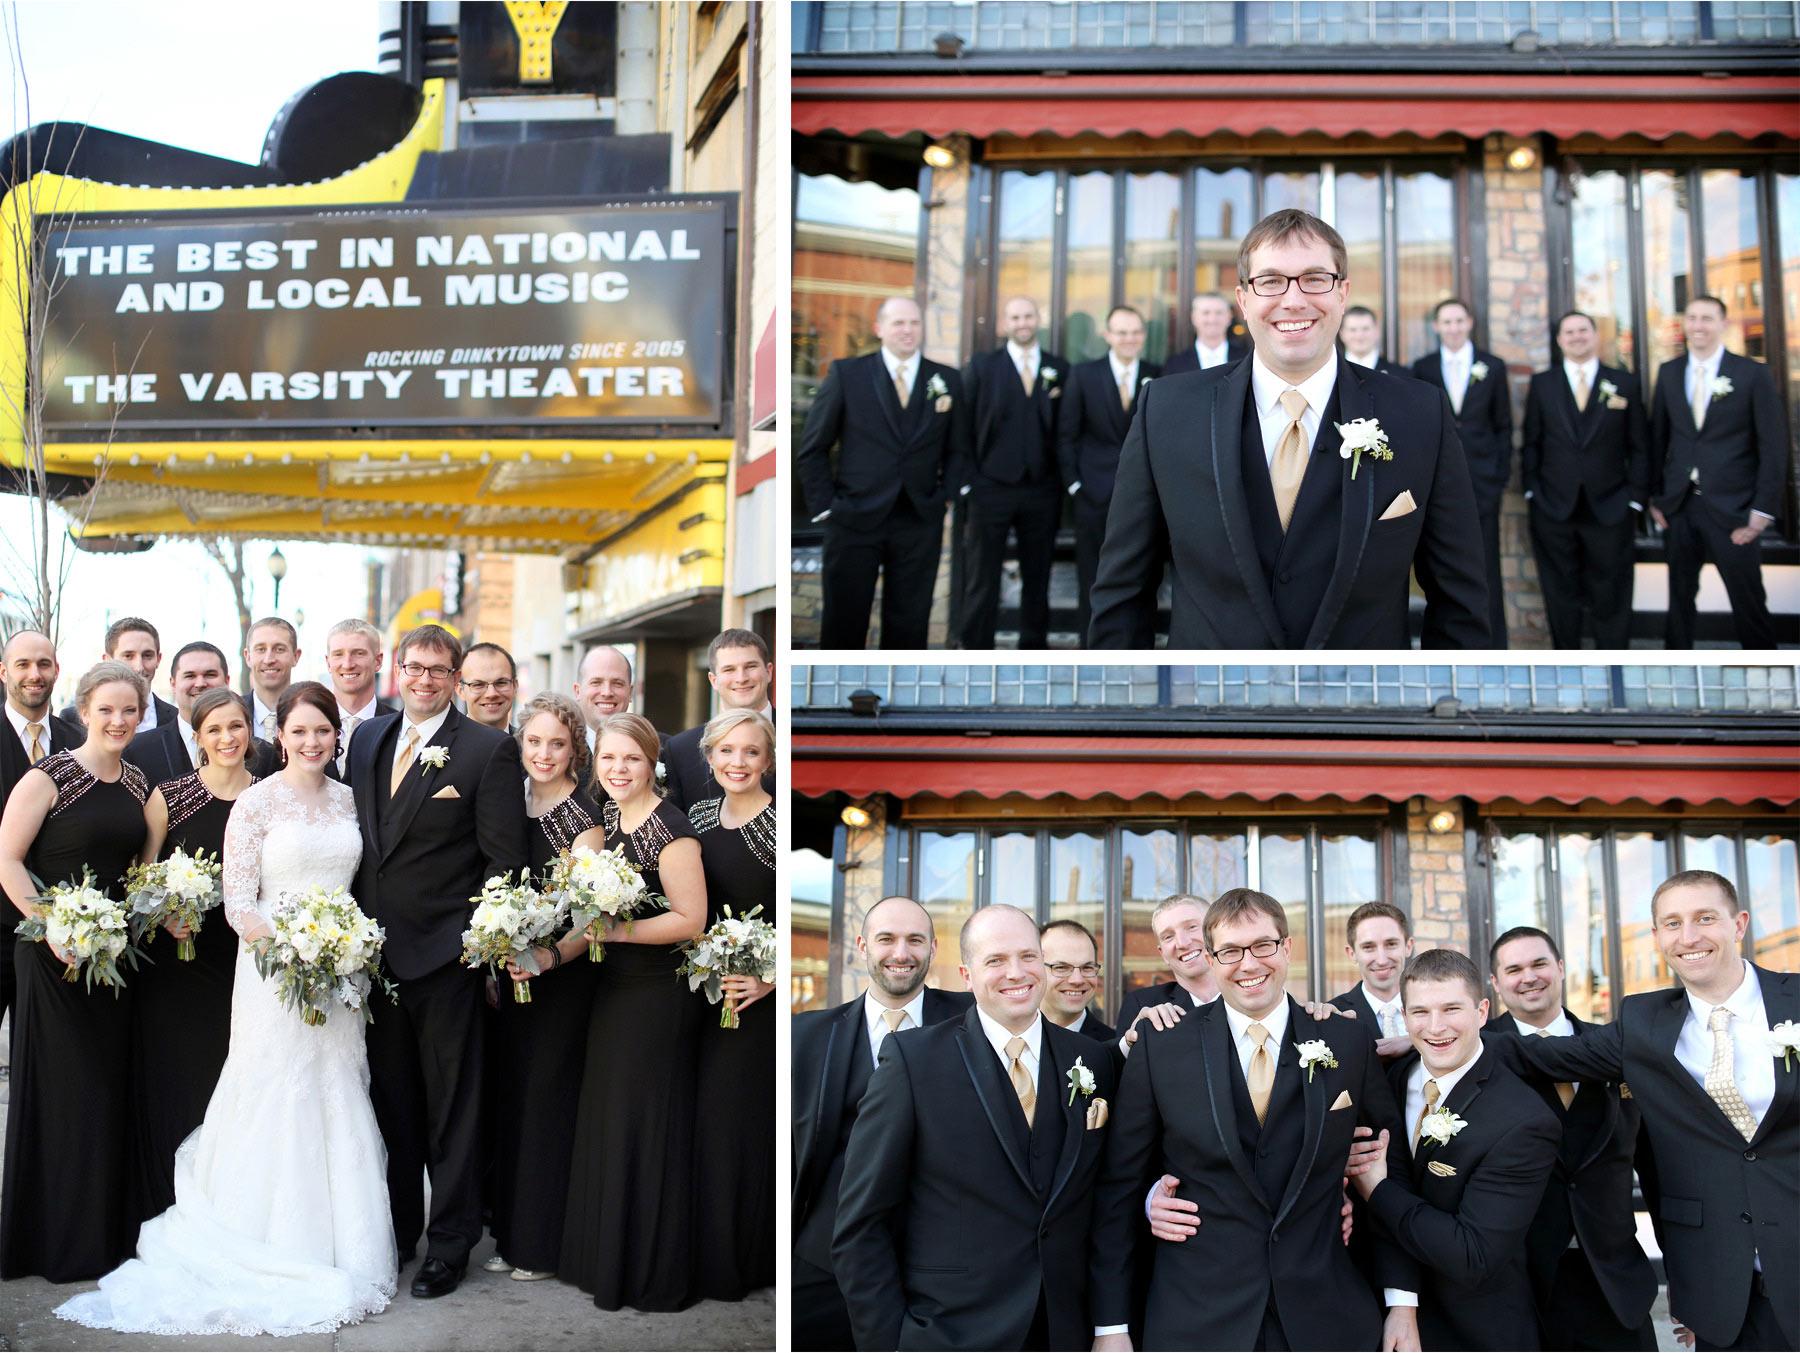 08-Minneapolis-Minnesota-Wedding-Photographer-by-Andrew-Vick-Photography-Winter-Varsity-Theater-Bride-Groom-Flowers-Loring-Pasta-Bar-Bridal-Party-Groomsmen-Bridesmaids-Sara-and-Rob.jpg